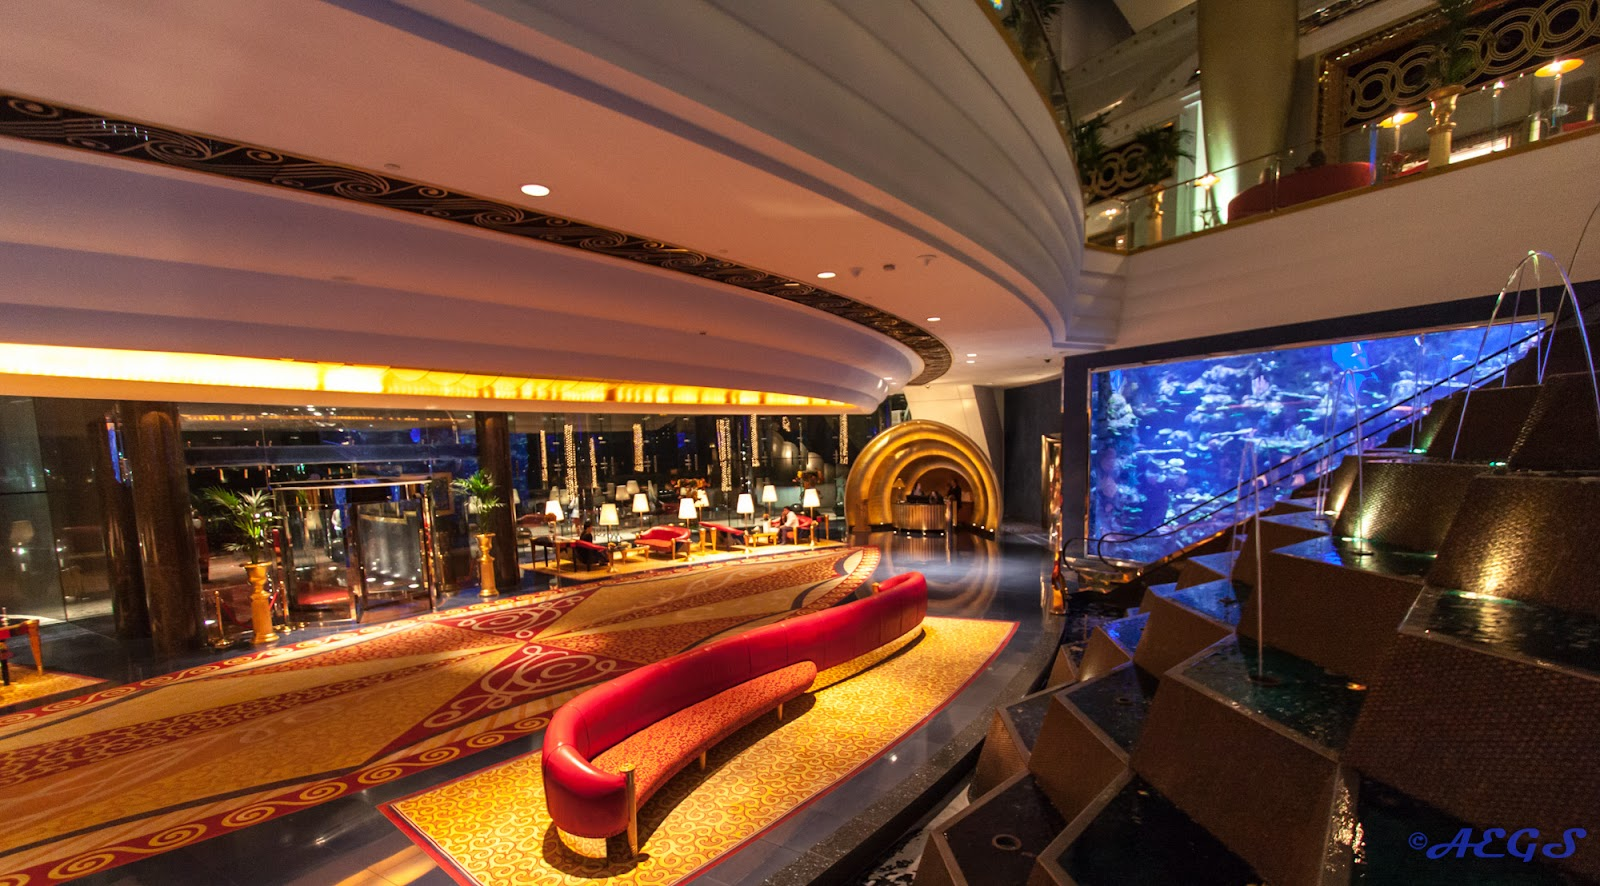 Dubai hotels 7 star browse info on dubai hotels 7 star for Dubai hotels 7 star rooms